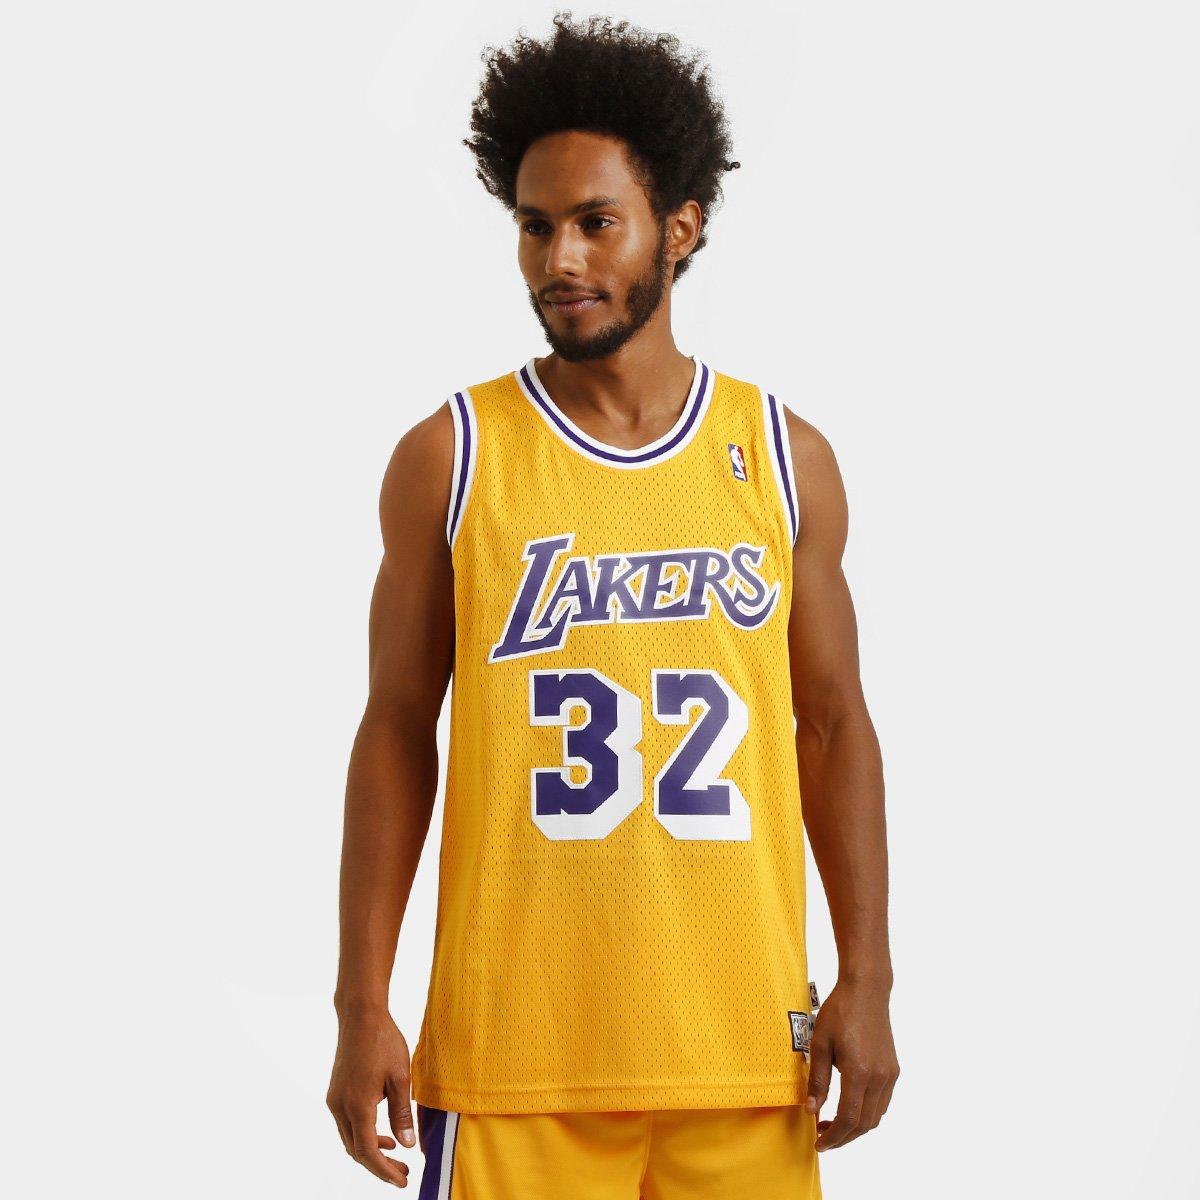 dbf50d66e Camiseta Regata Adidas NBA Retired Los Angeles Lakers - Johnson - Compre  Agora